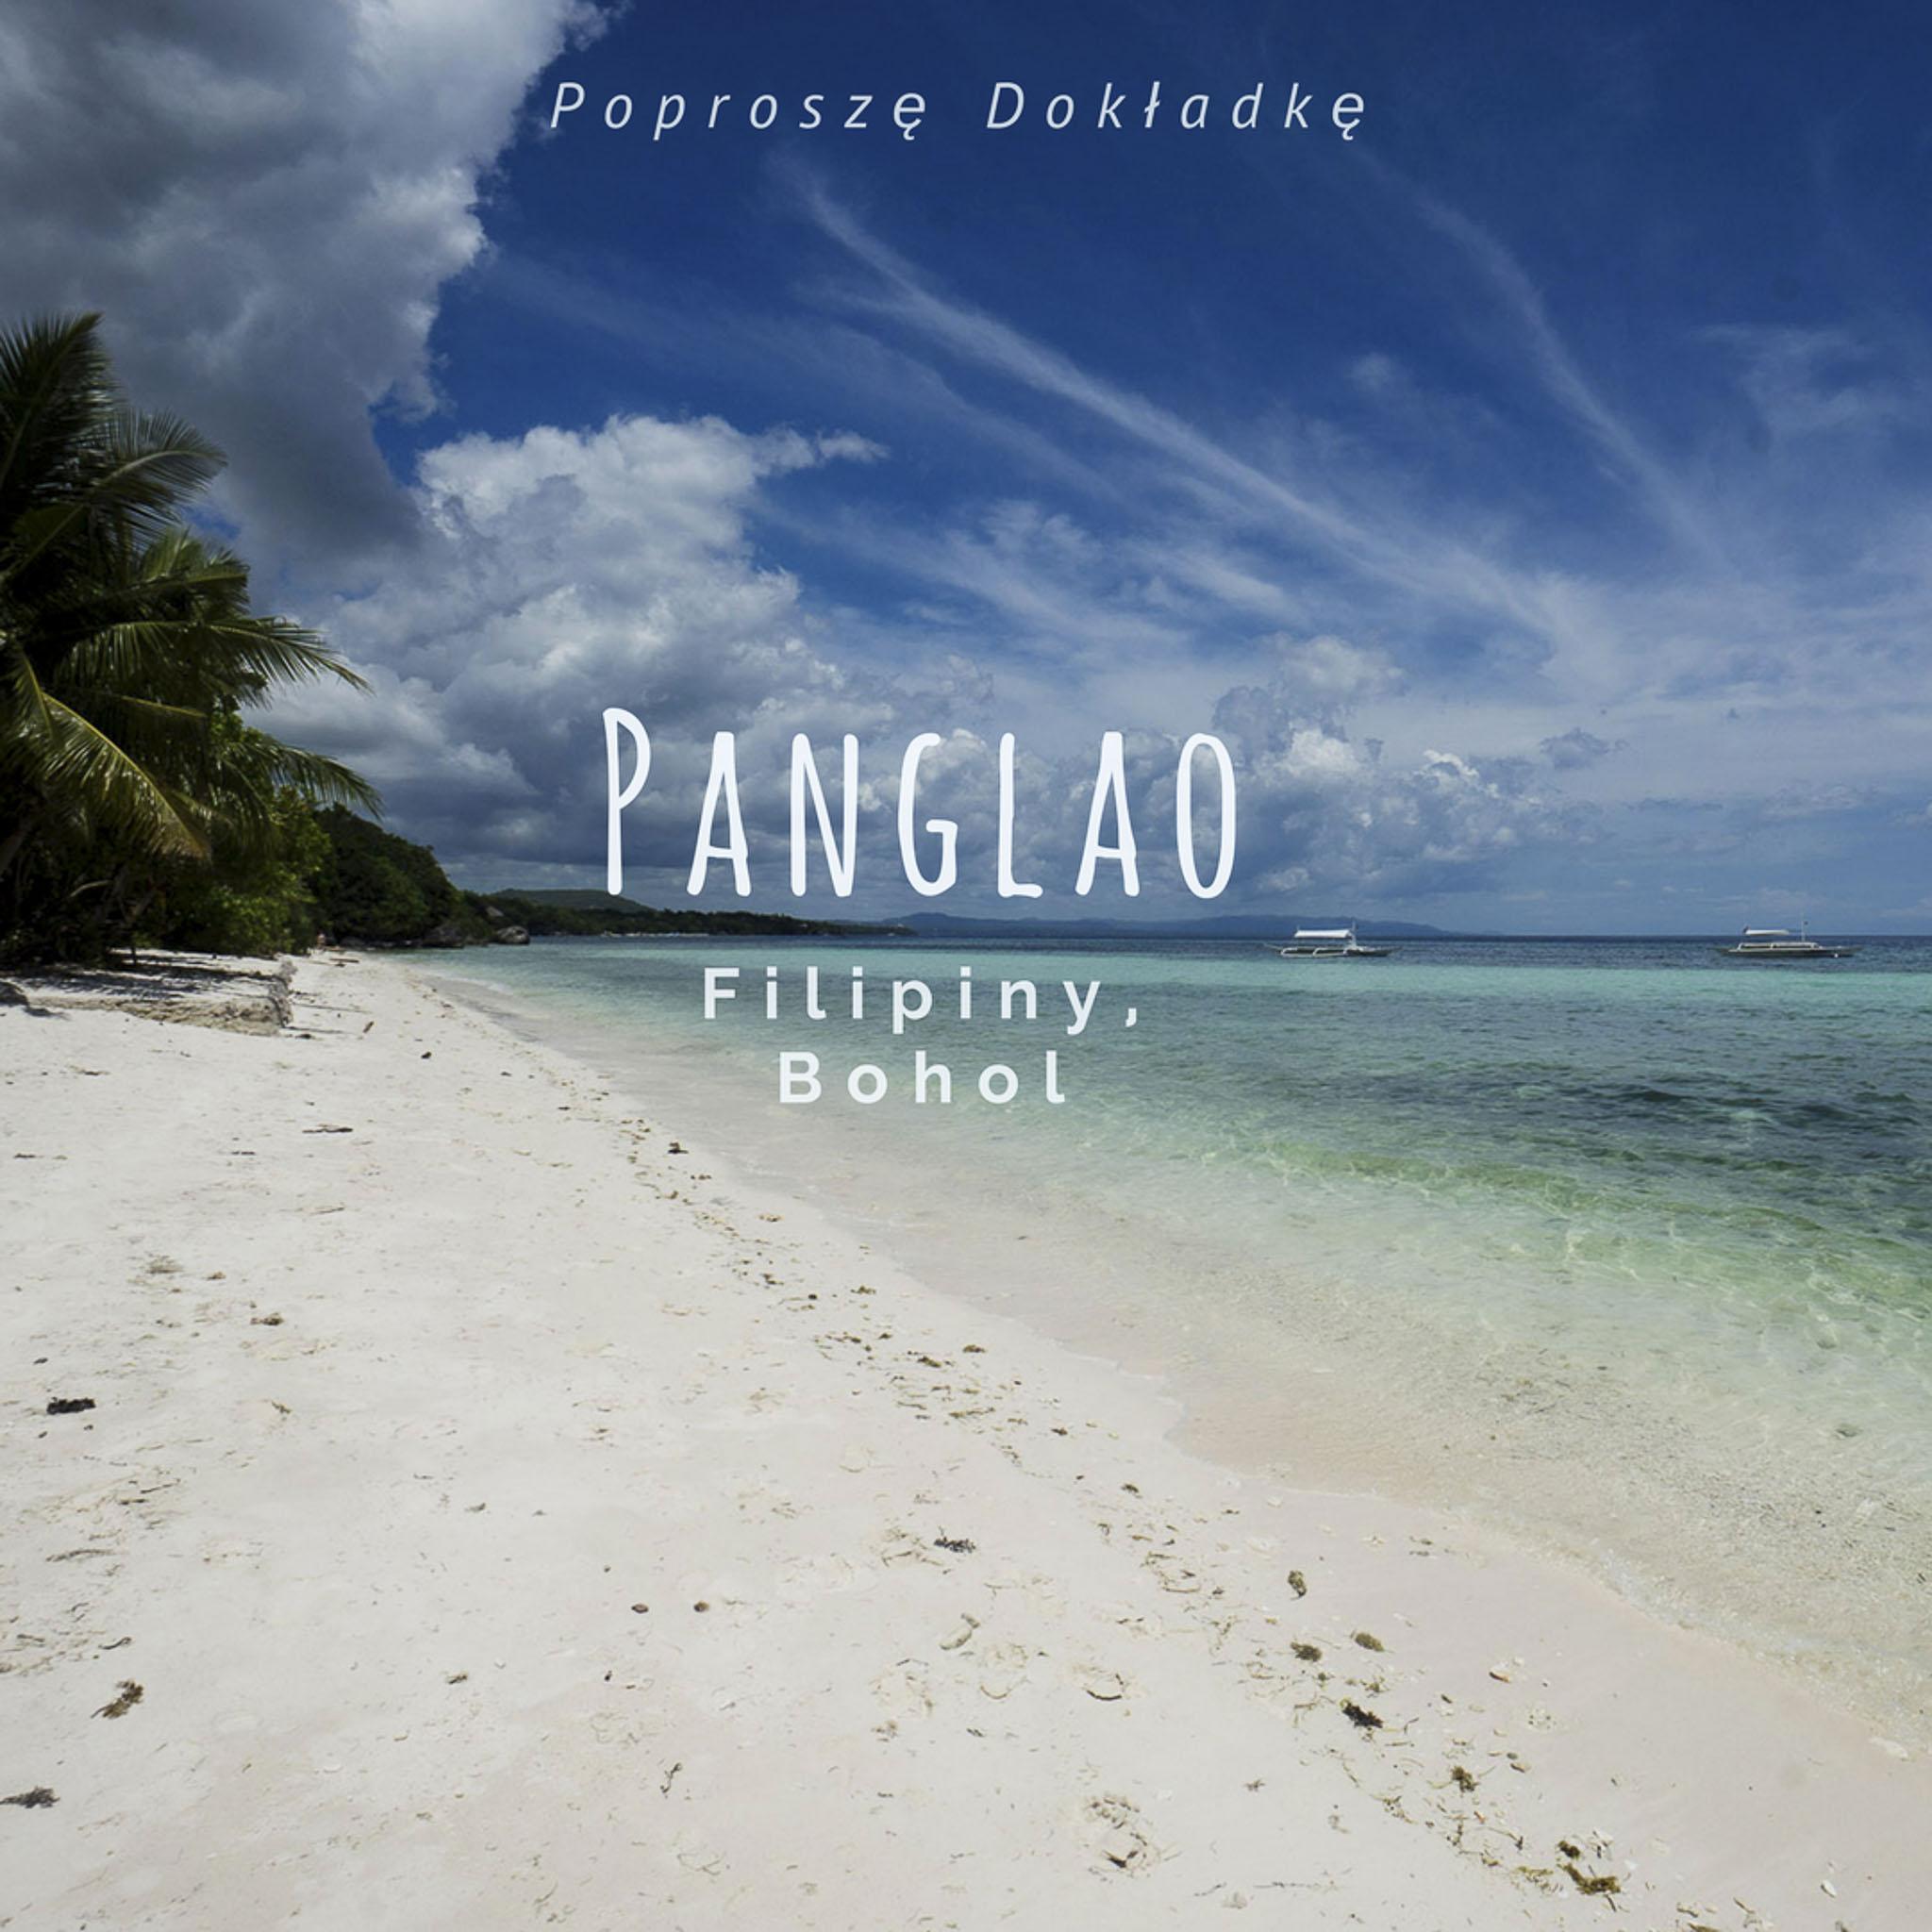 Panglao, Filipiny, Bohol